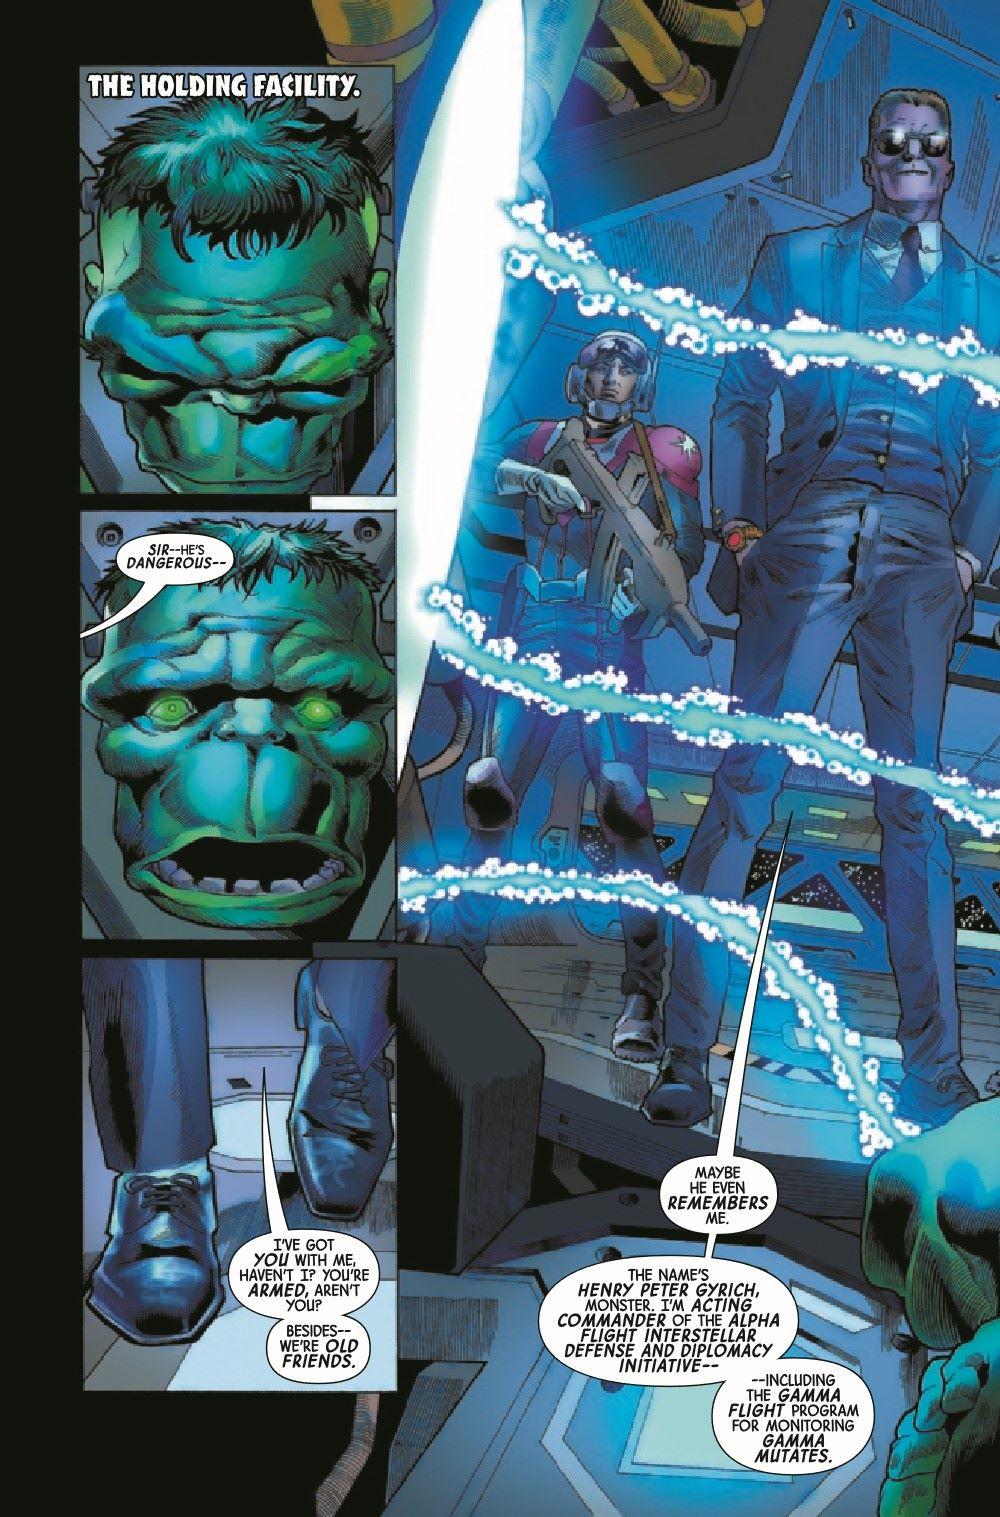 HULK2018040_Preview-2 ComicList Previews: IMMORTAL HULK #40